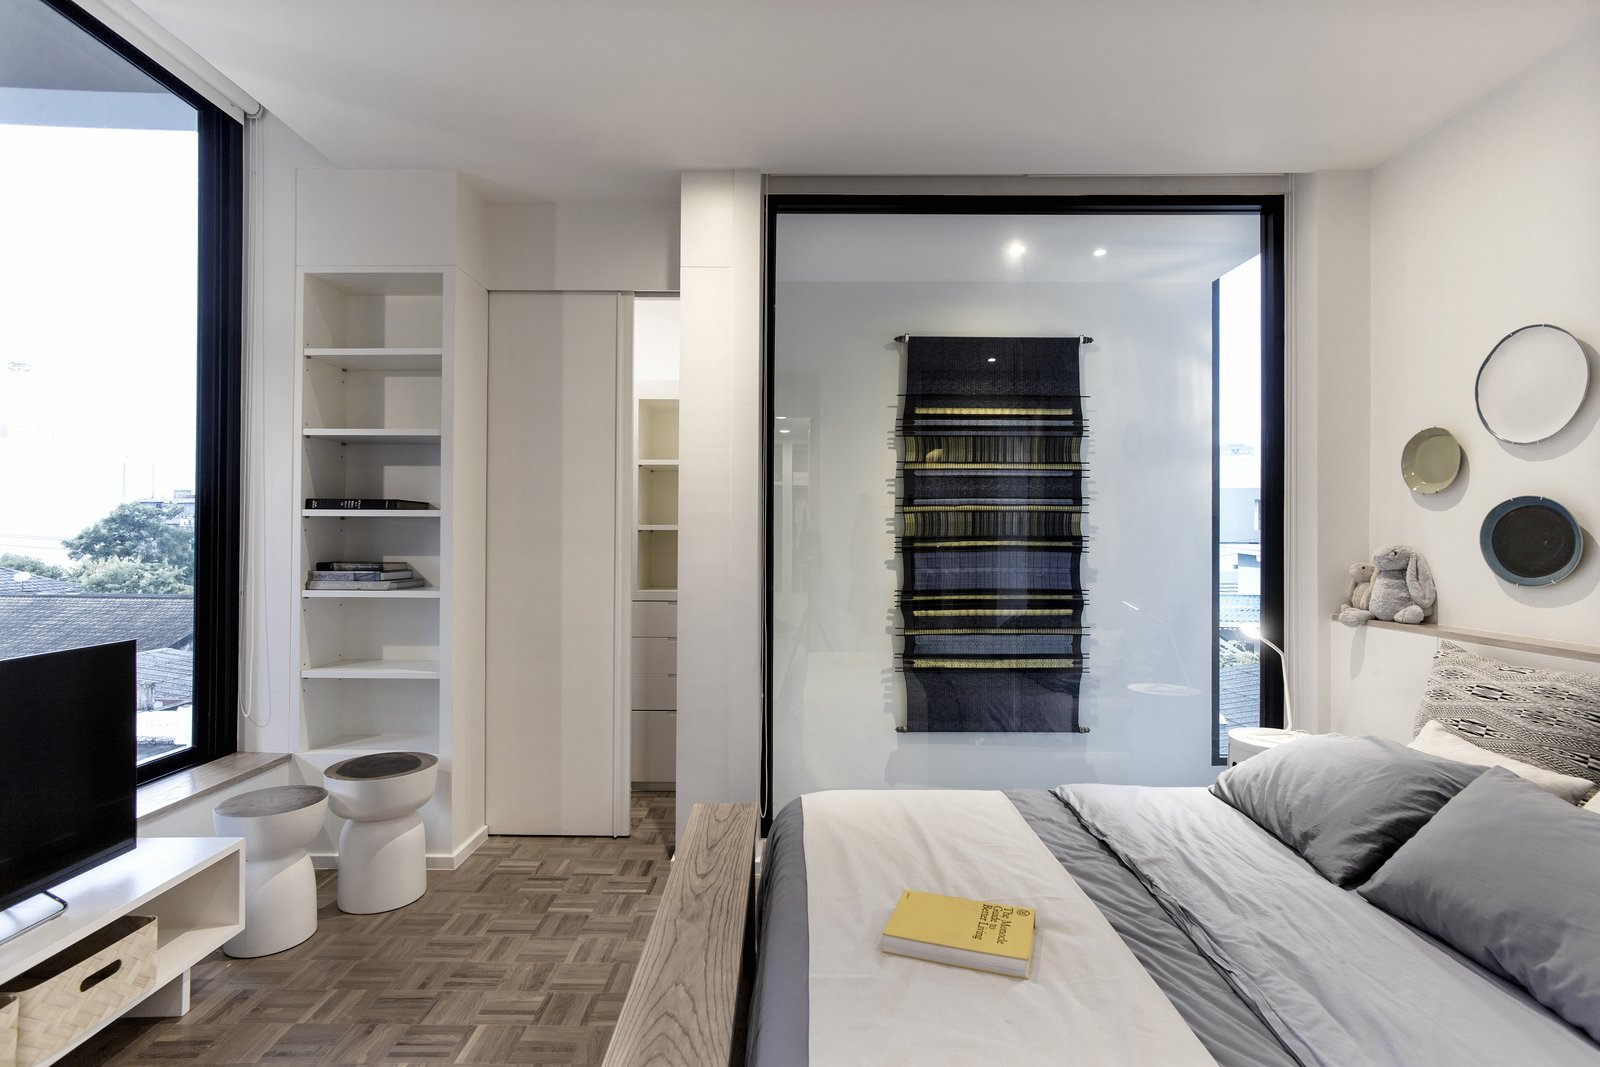 Bedroom, Bed, Wardrobe, Bench, Bookcase, Ceiling Lighting, and Light Hardwood Floor  Huamark 09